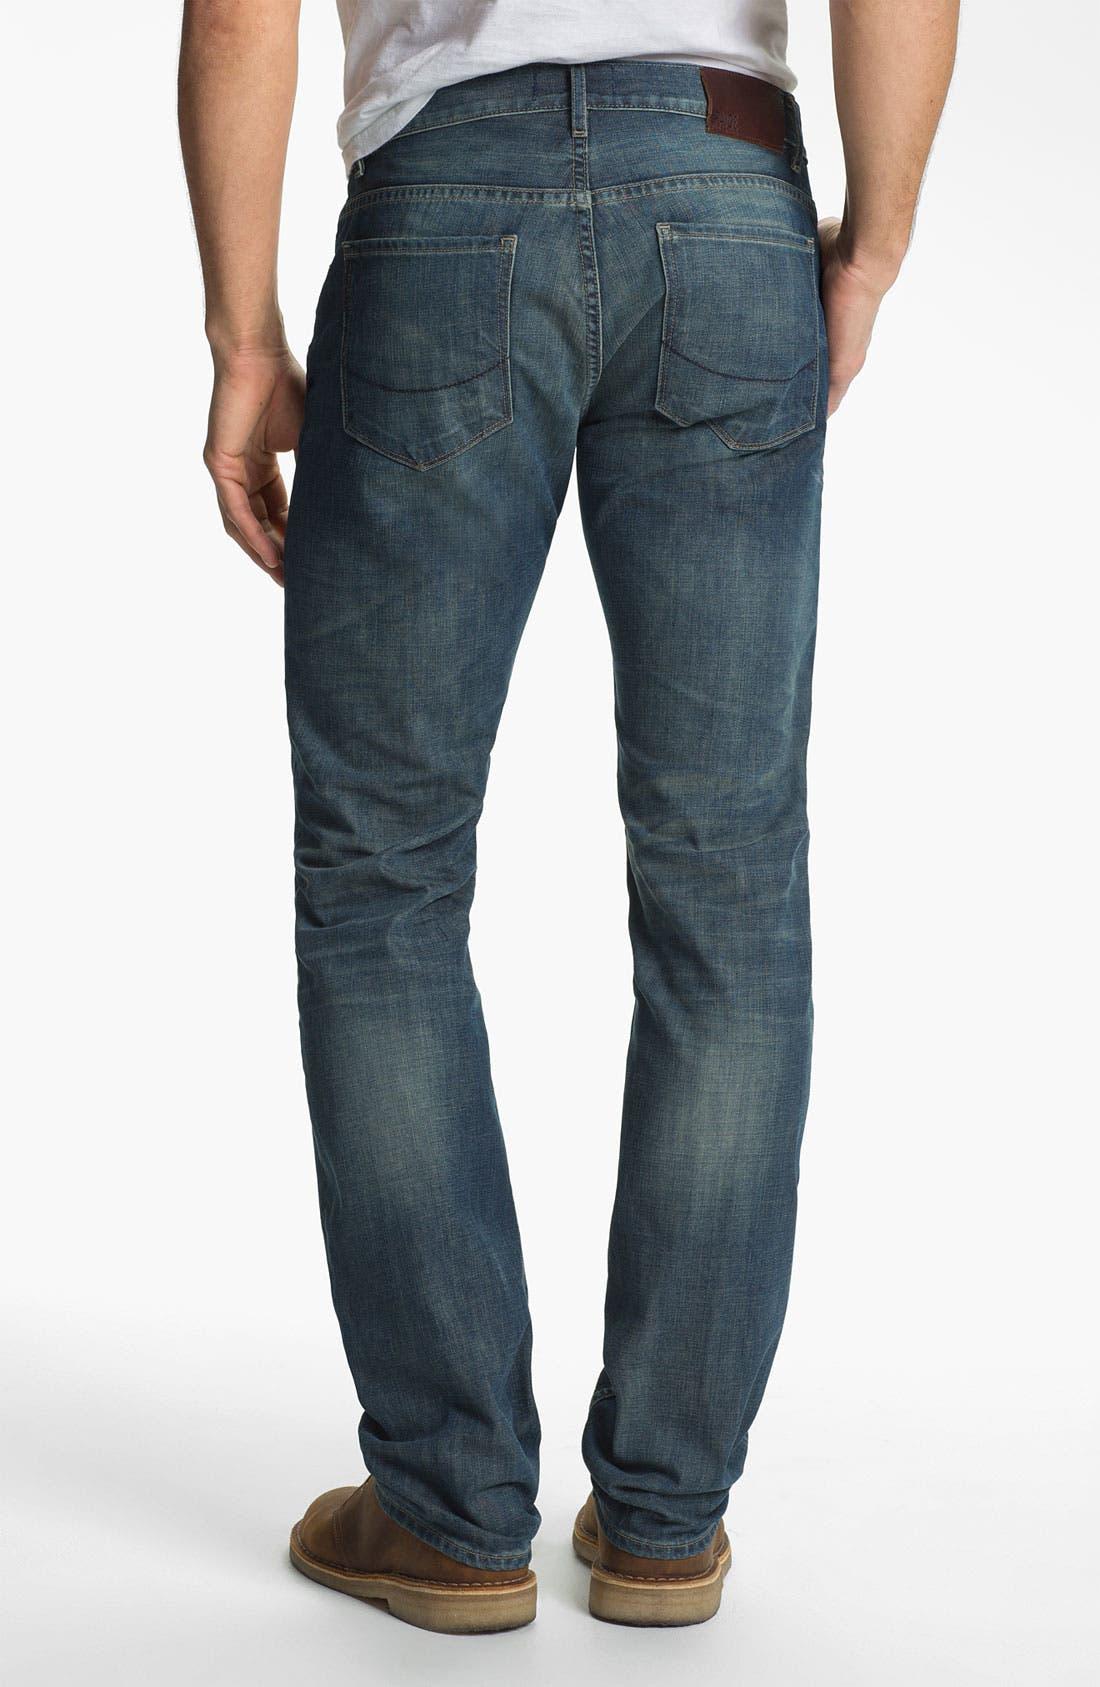 Alternate Image 1 Selected - PAIGE 'Normandie' Slim Straight Leg Jeans (Lowtide)